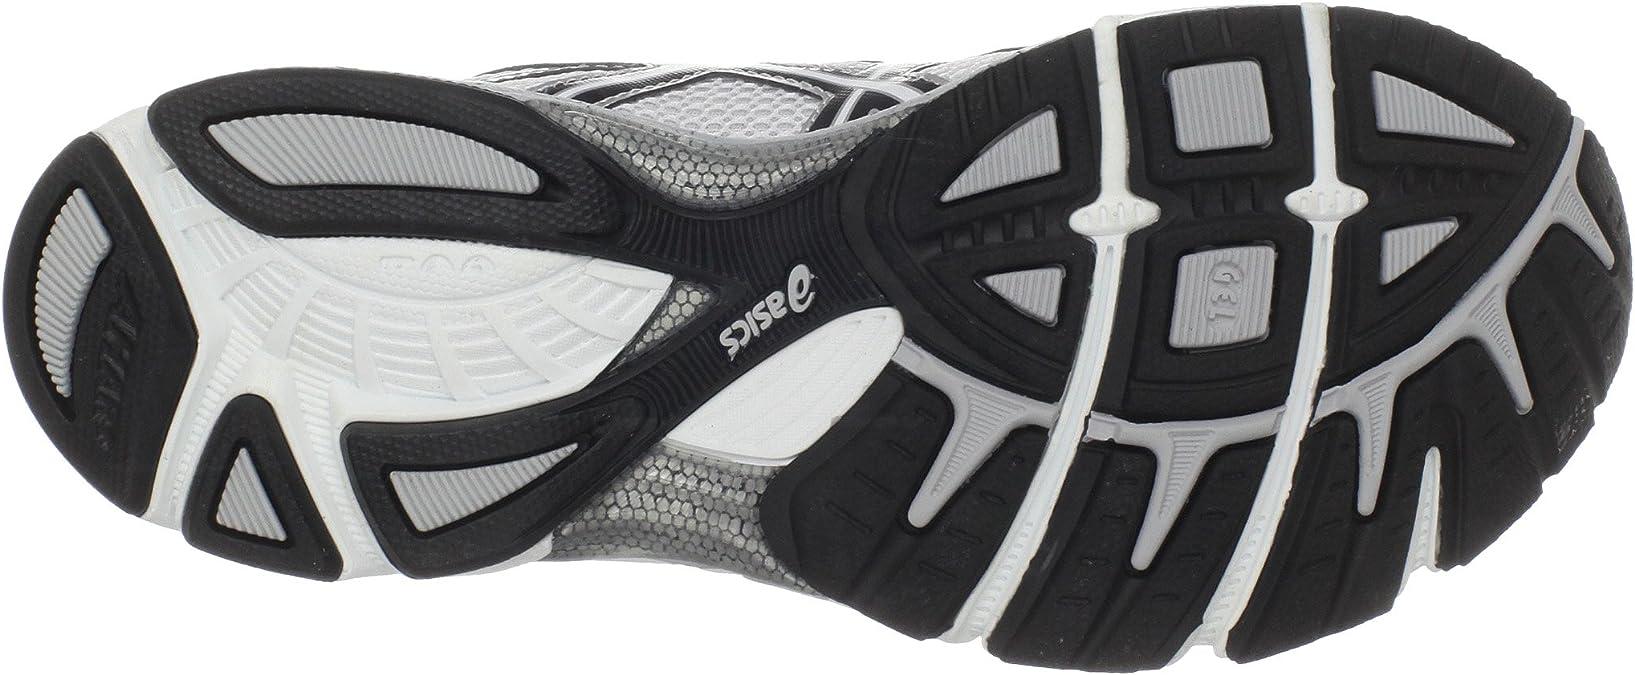 | ASICS Men's GEL 1160 Running Shoe | Road Running